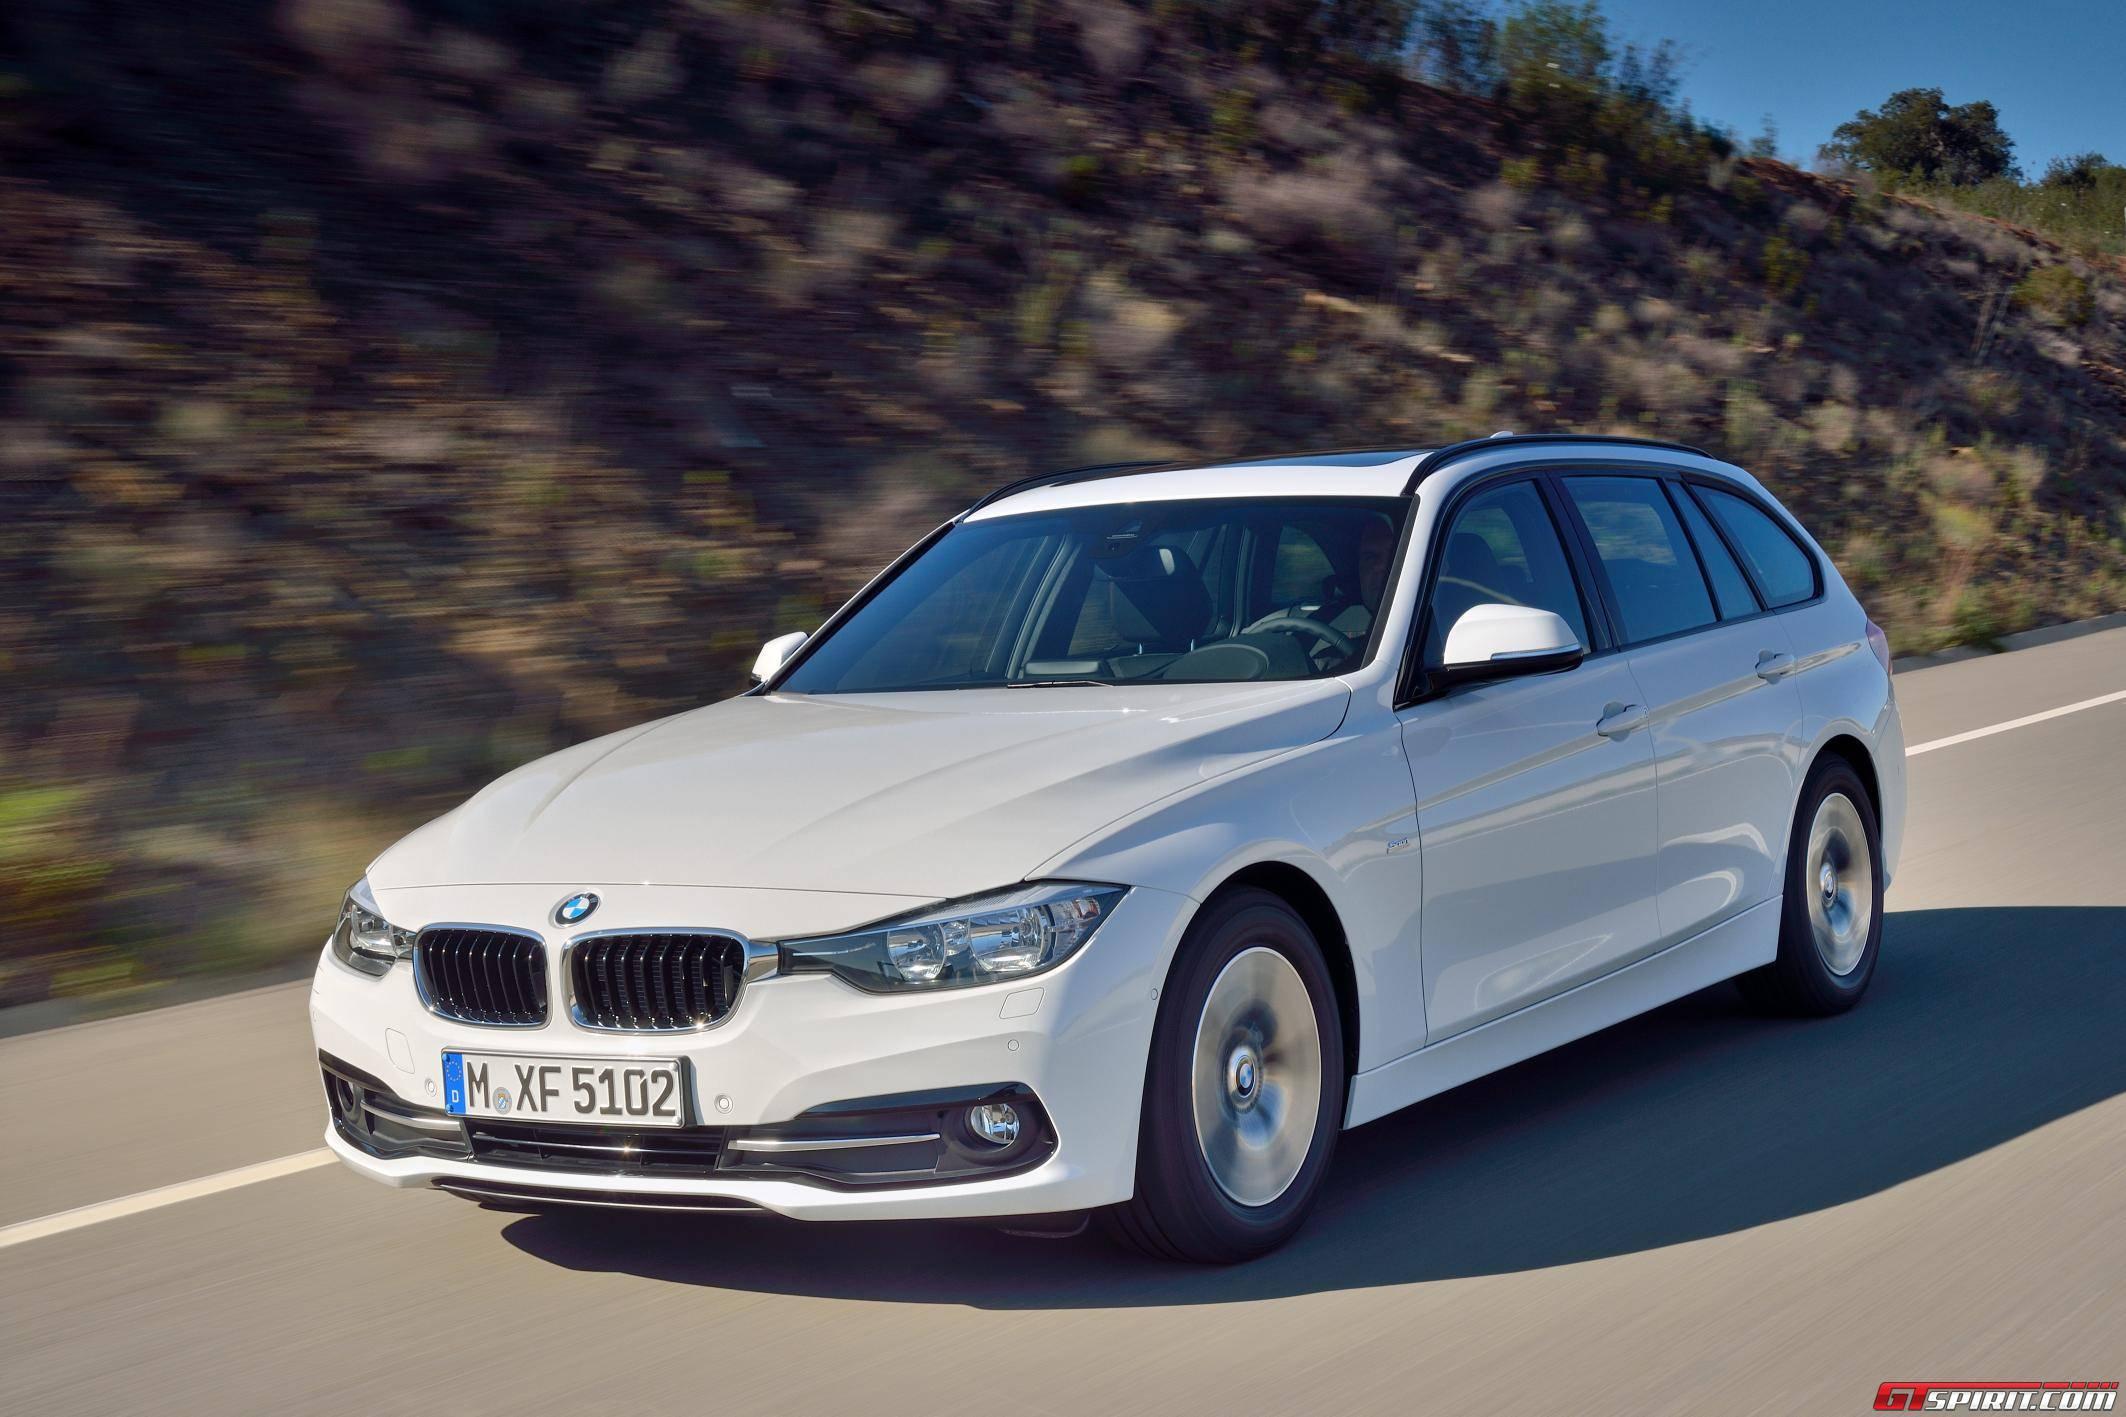 ficial 2016 BMW 3 Series Facelift GTspirit